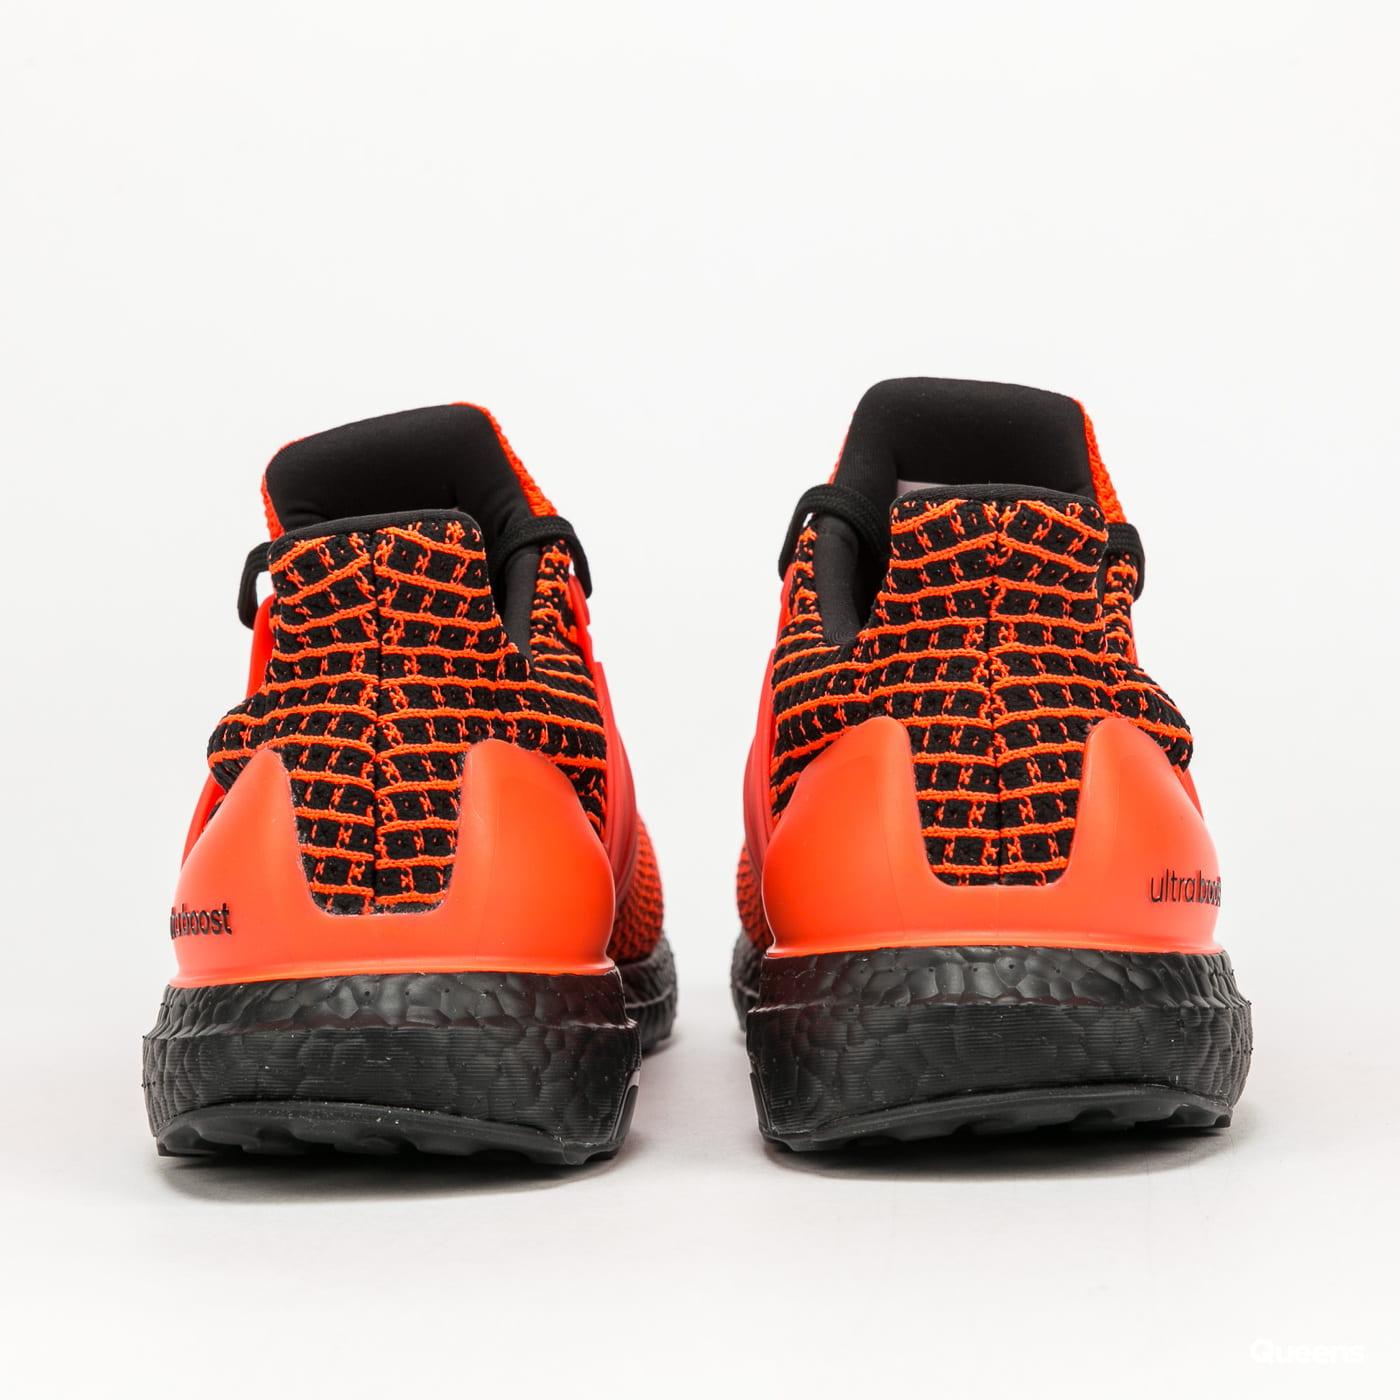 adidas Performance Ultraboost 5.0 DNA solar red / solar red / cblack